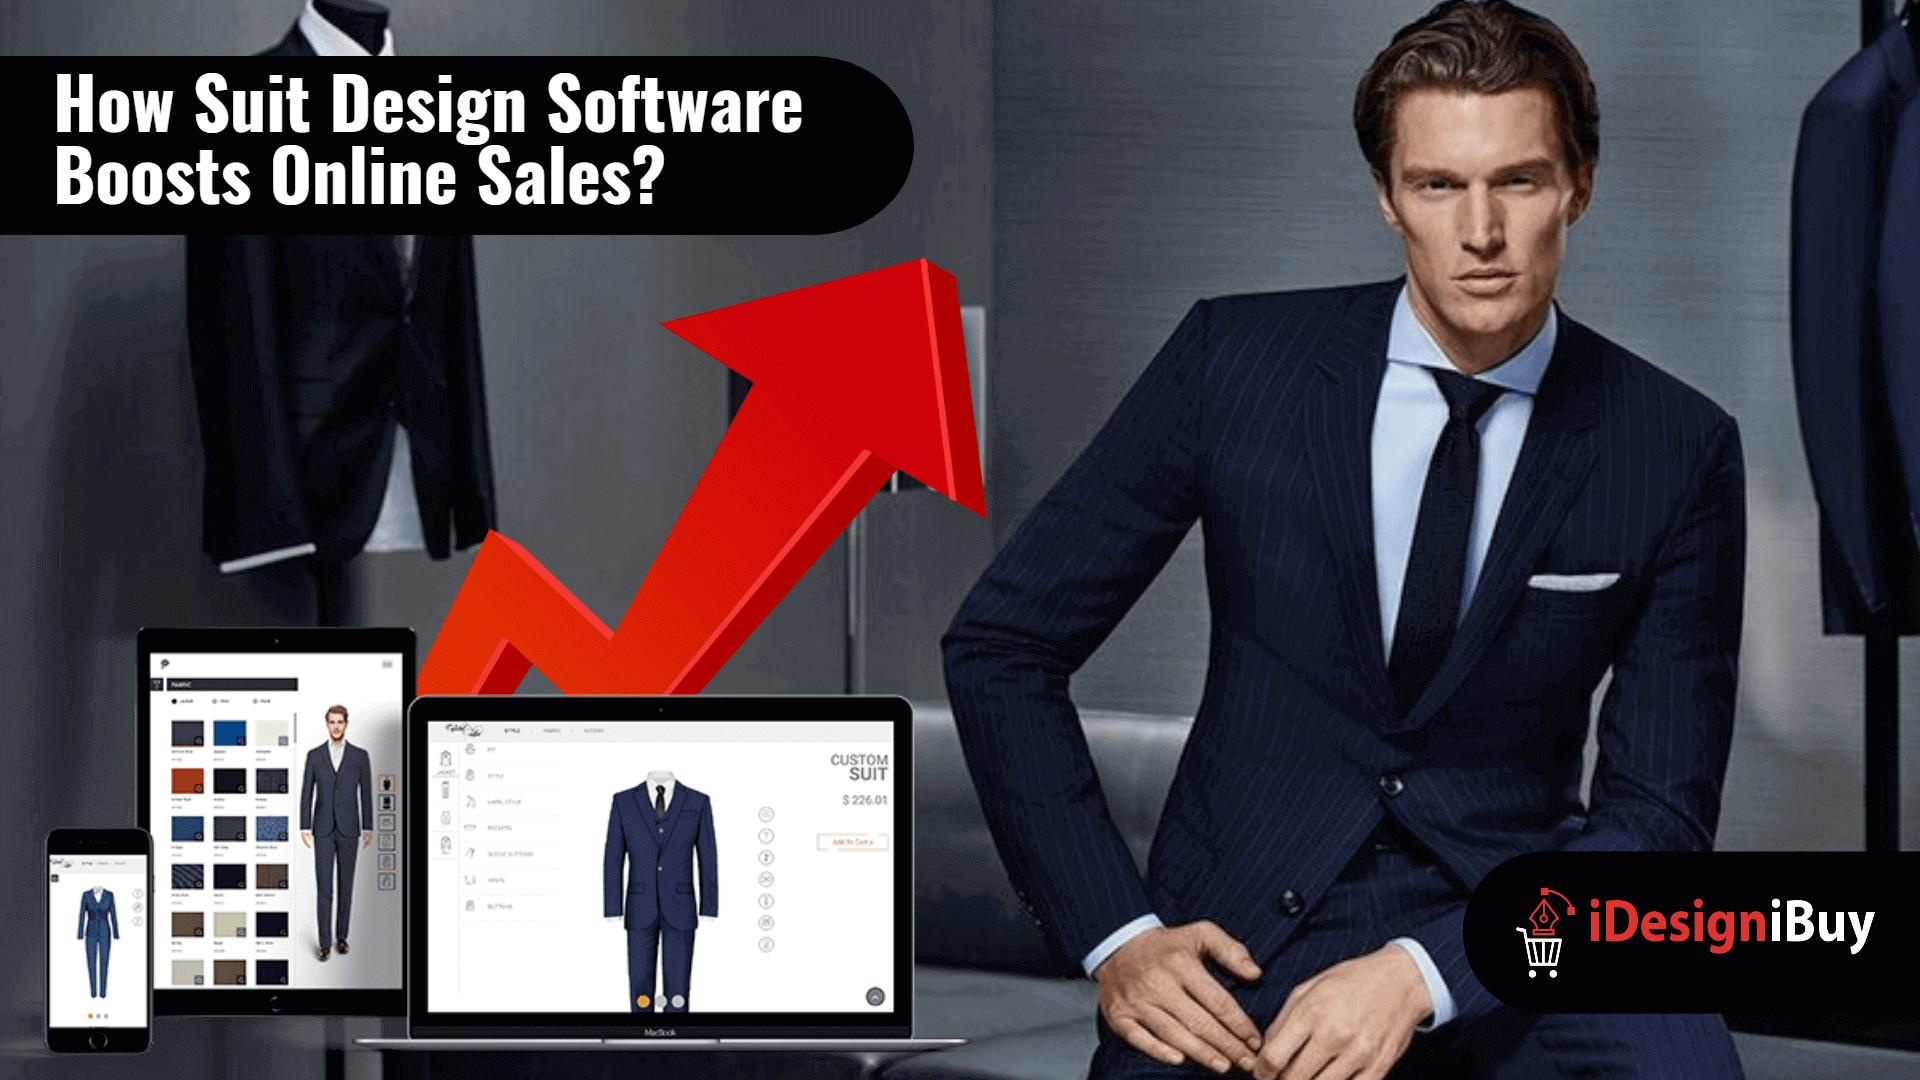 How Suit Design Software Boosts Online Sales?